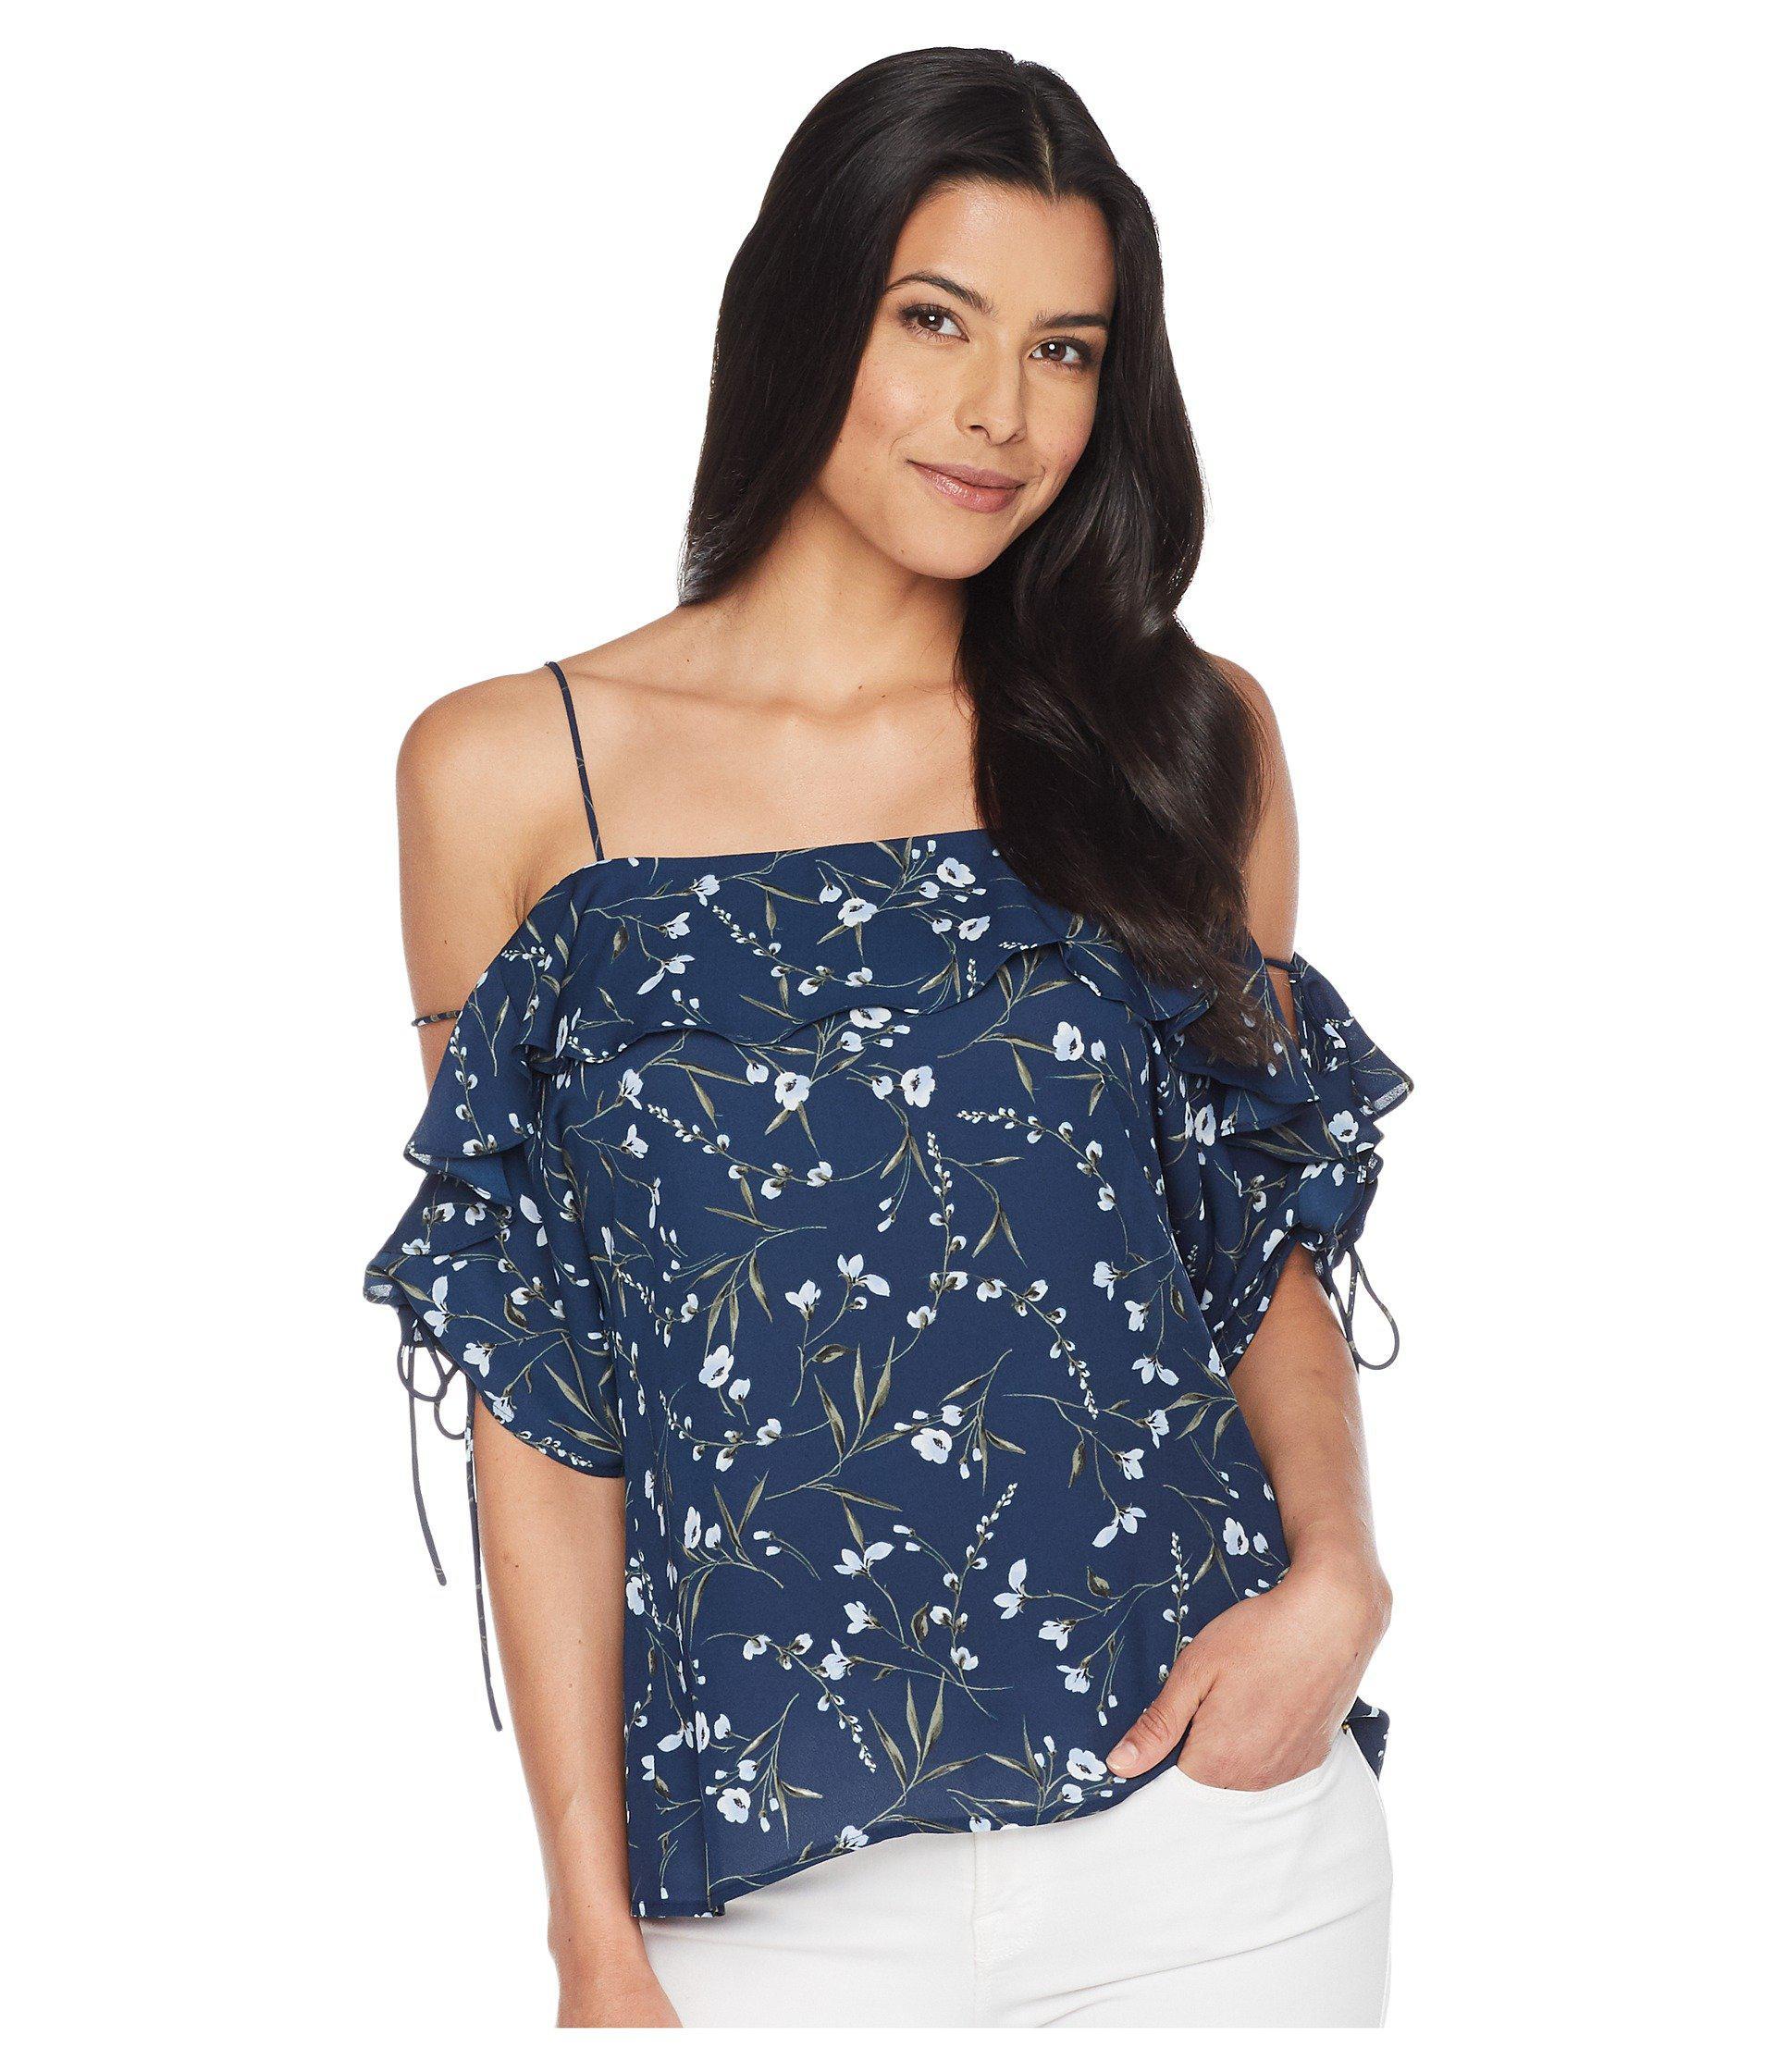 f3601c0094fb34 Lyst - Cece Off The Shoulder Graceful Floral Blouse in Blue - Save 56%